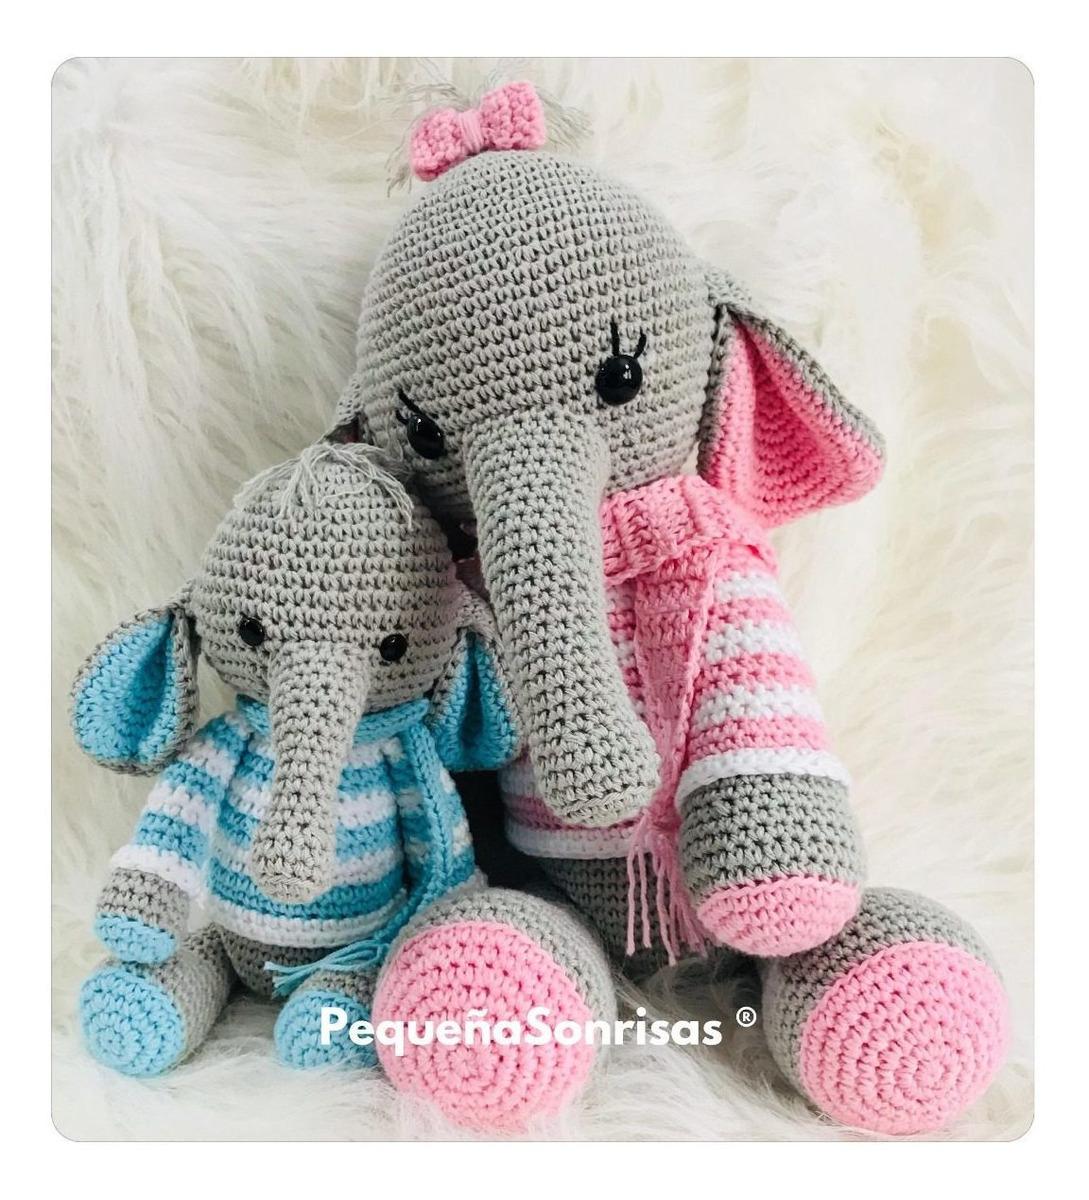 Crochet Pattern - Elephant Nina | Haakpatronen, Patronen, Gehaakte ... | 1200x1089